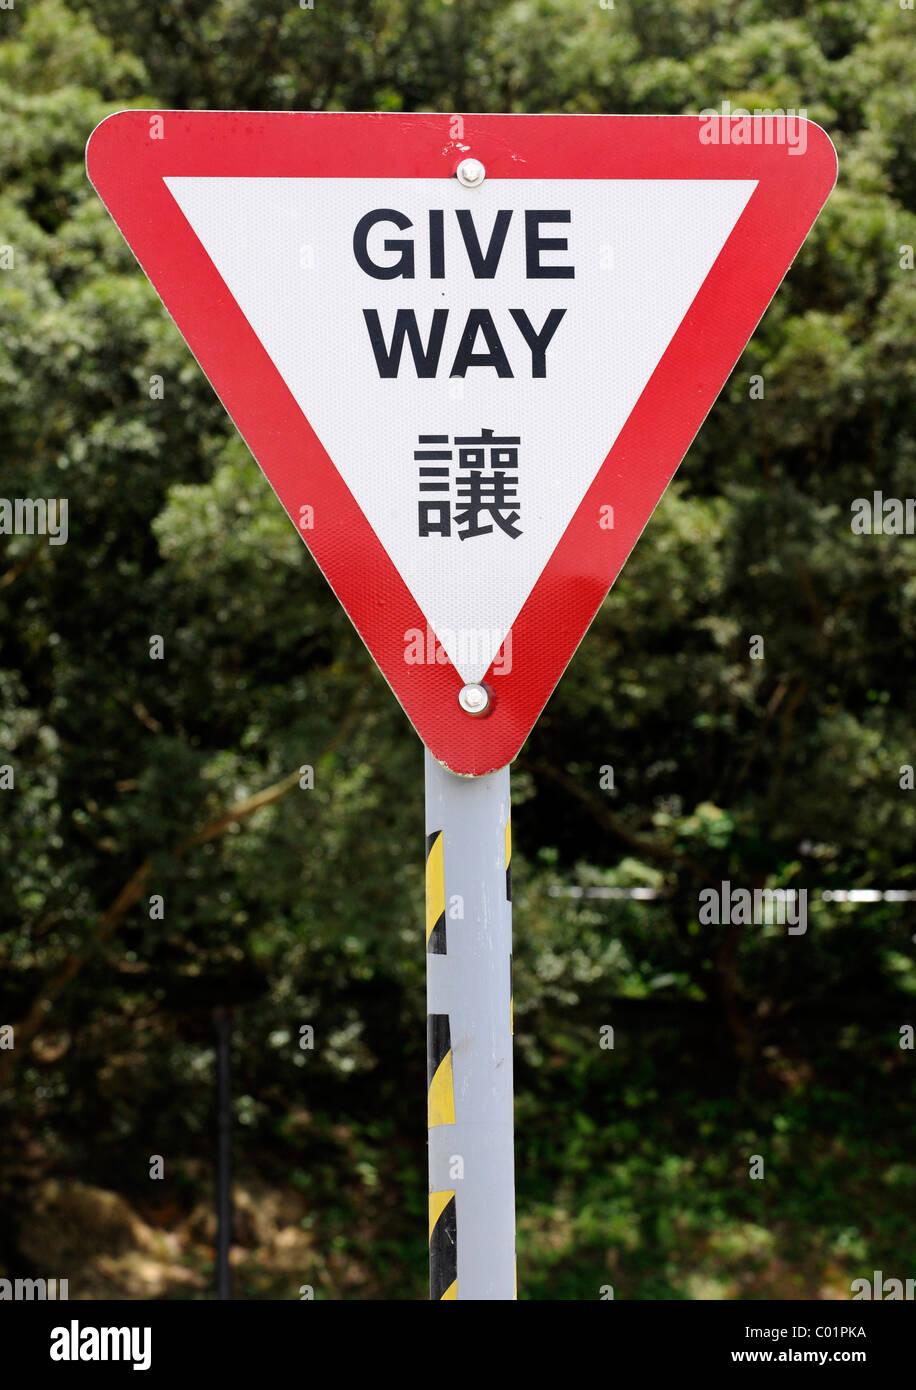 Chinesischen Verkehr Zeichen, Ertrag, Hong Kong, China, Asien Stockbild